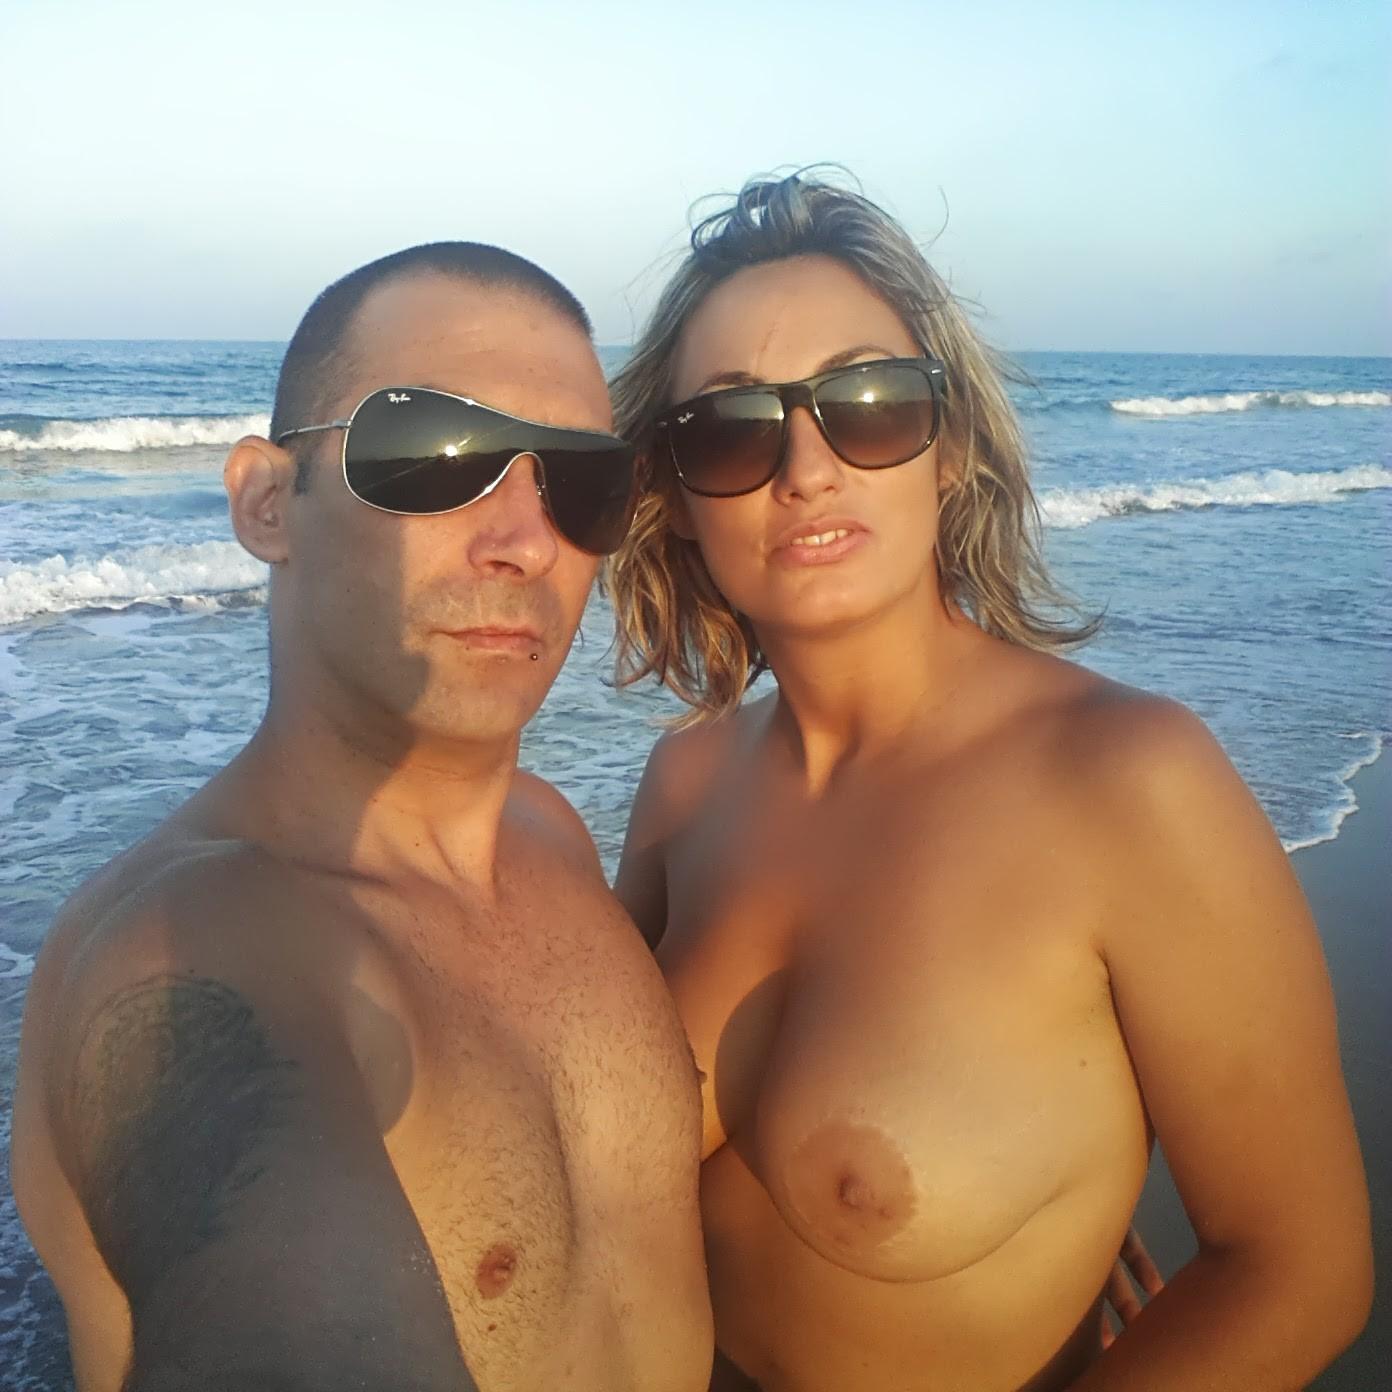 Culonas Fotos De Viejas Piernudas Y Tetonas Desnudas Zorras Rainpow